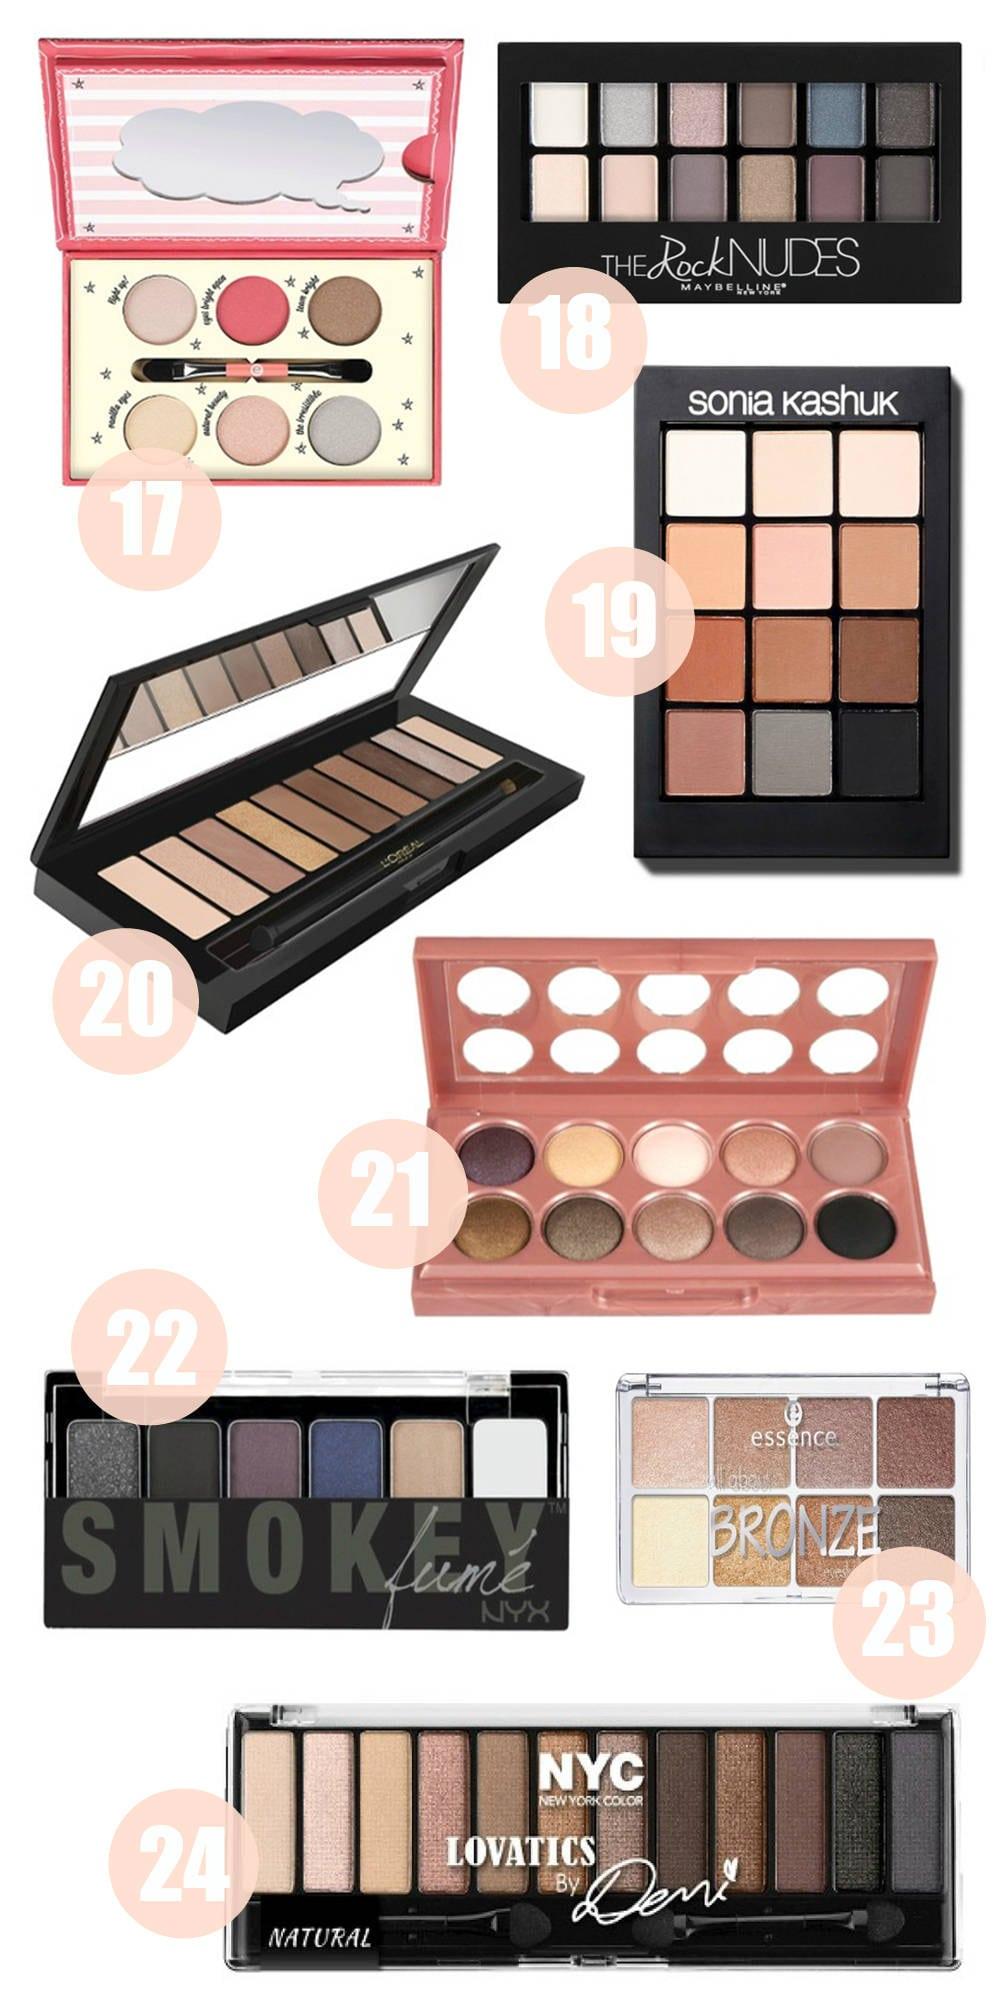 Beauty blogger Mash Elle shares her top eyeshadow palettes under $20 - The Best Drugstore Eyeshadow Palettes Under $20 by popular Orlando beauty blogger Mash Elle